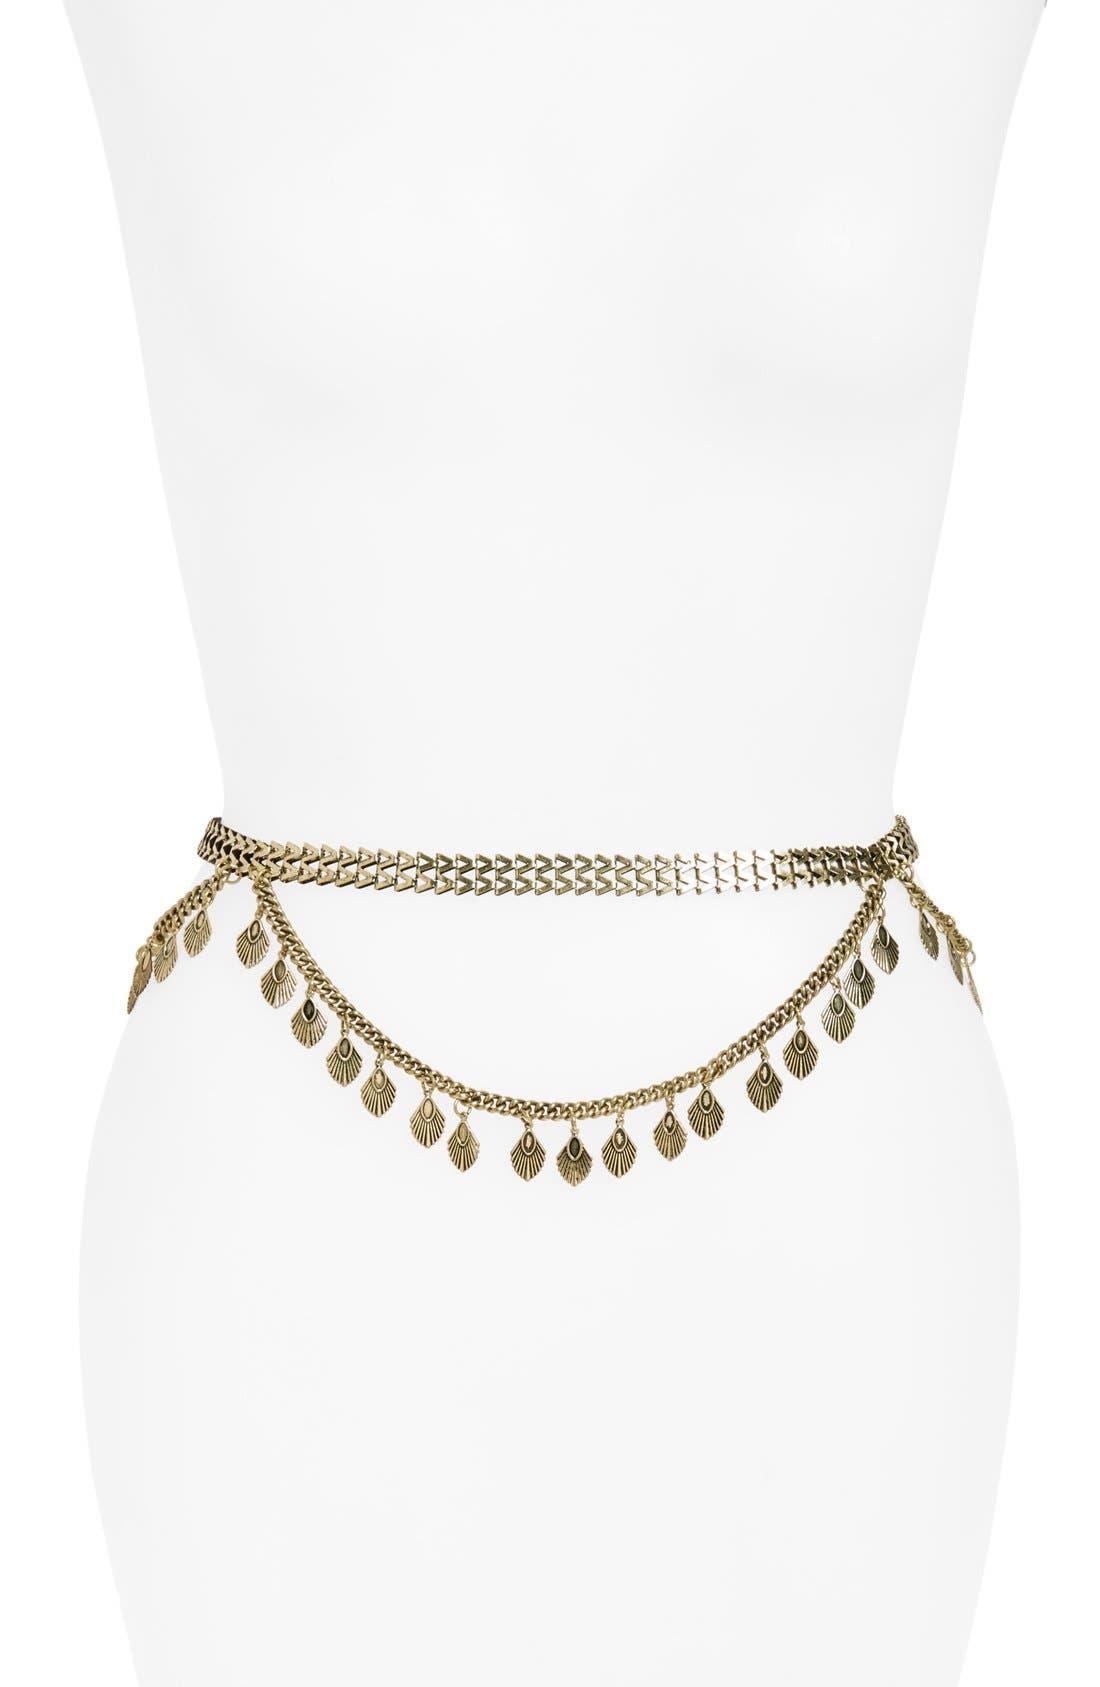 Alternate Image 1 Selected - BP. Draped Chain Belt